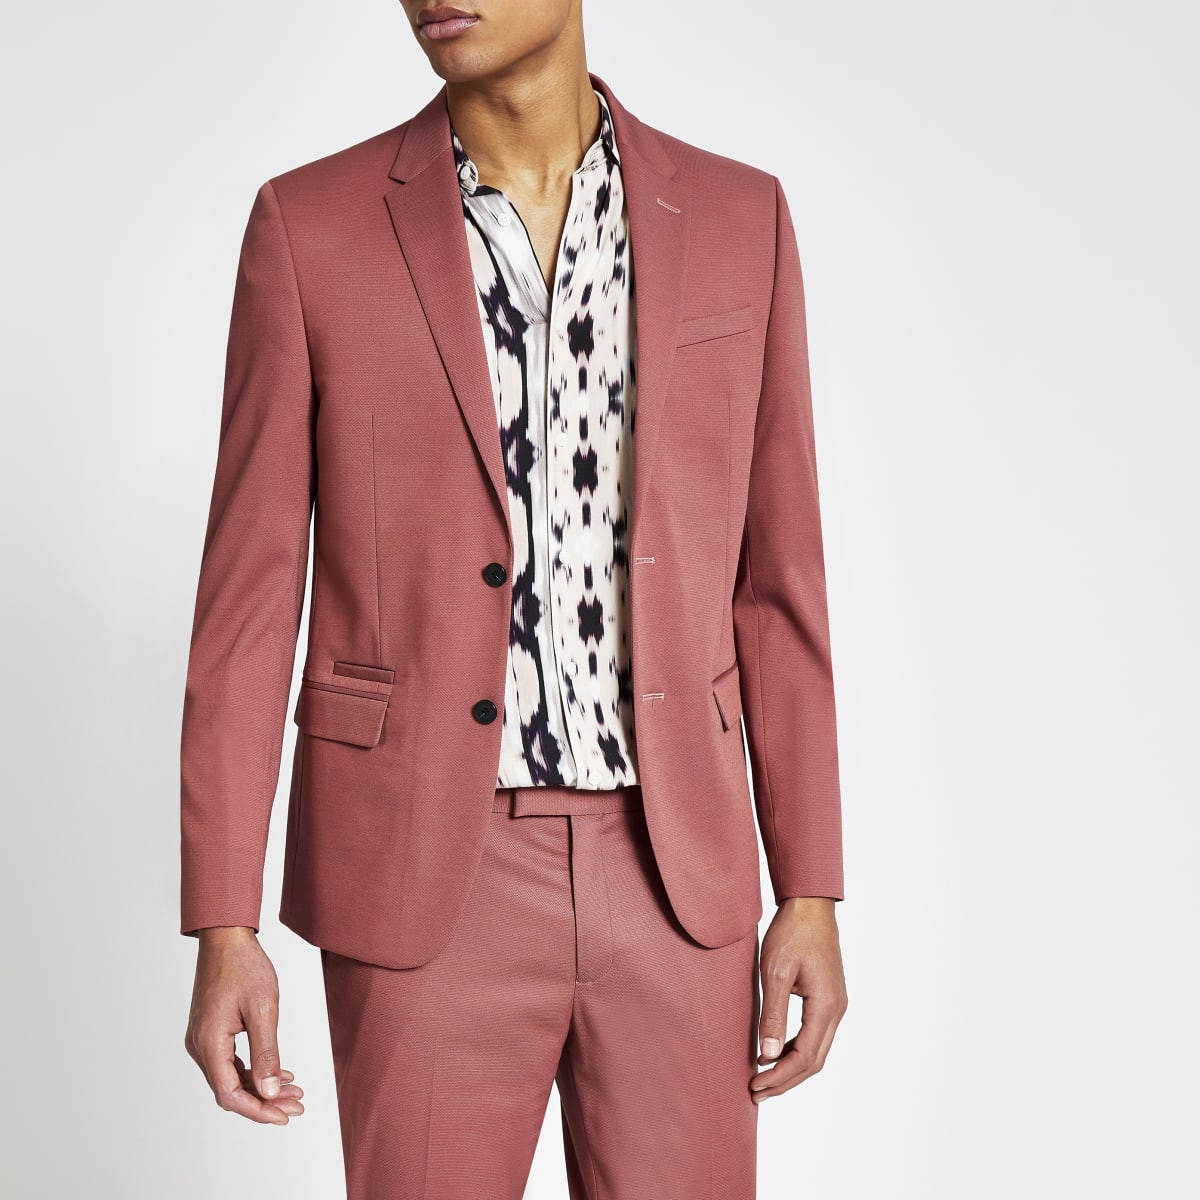 Pink single breasted skinny suit jacket